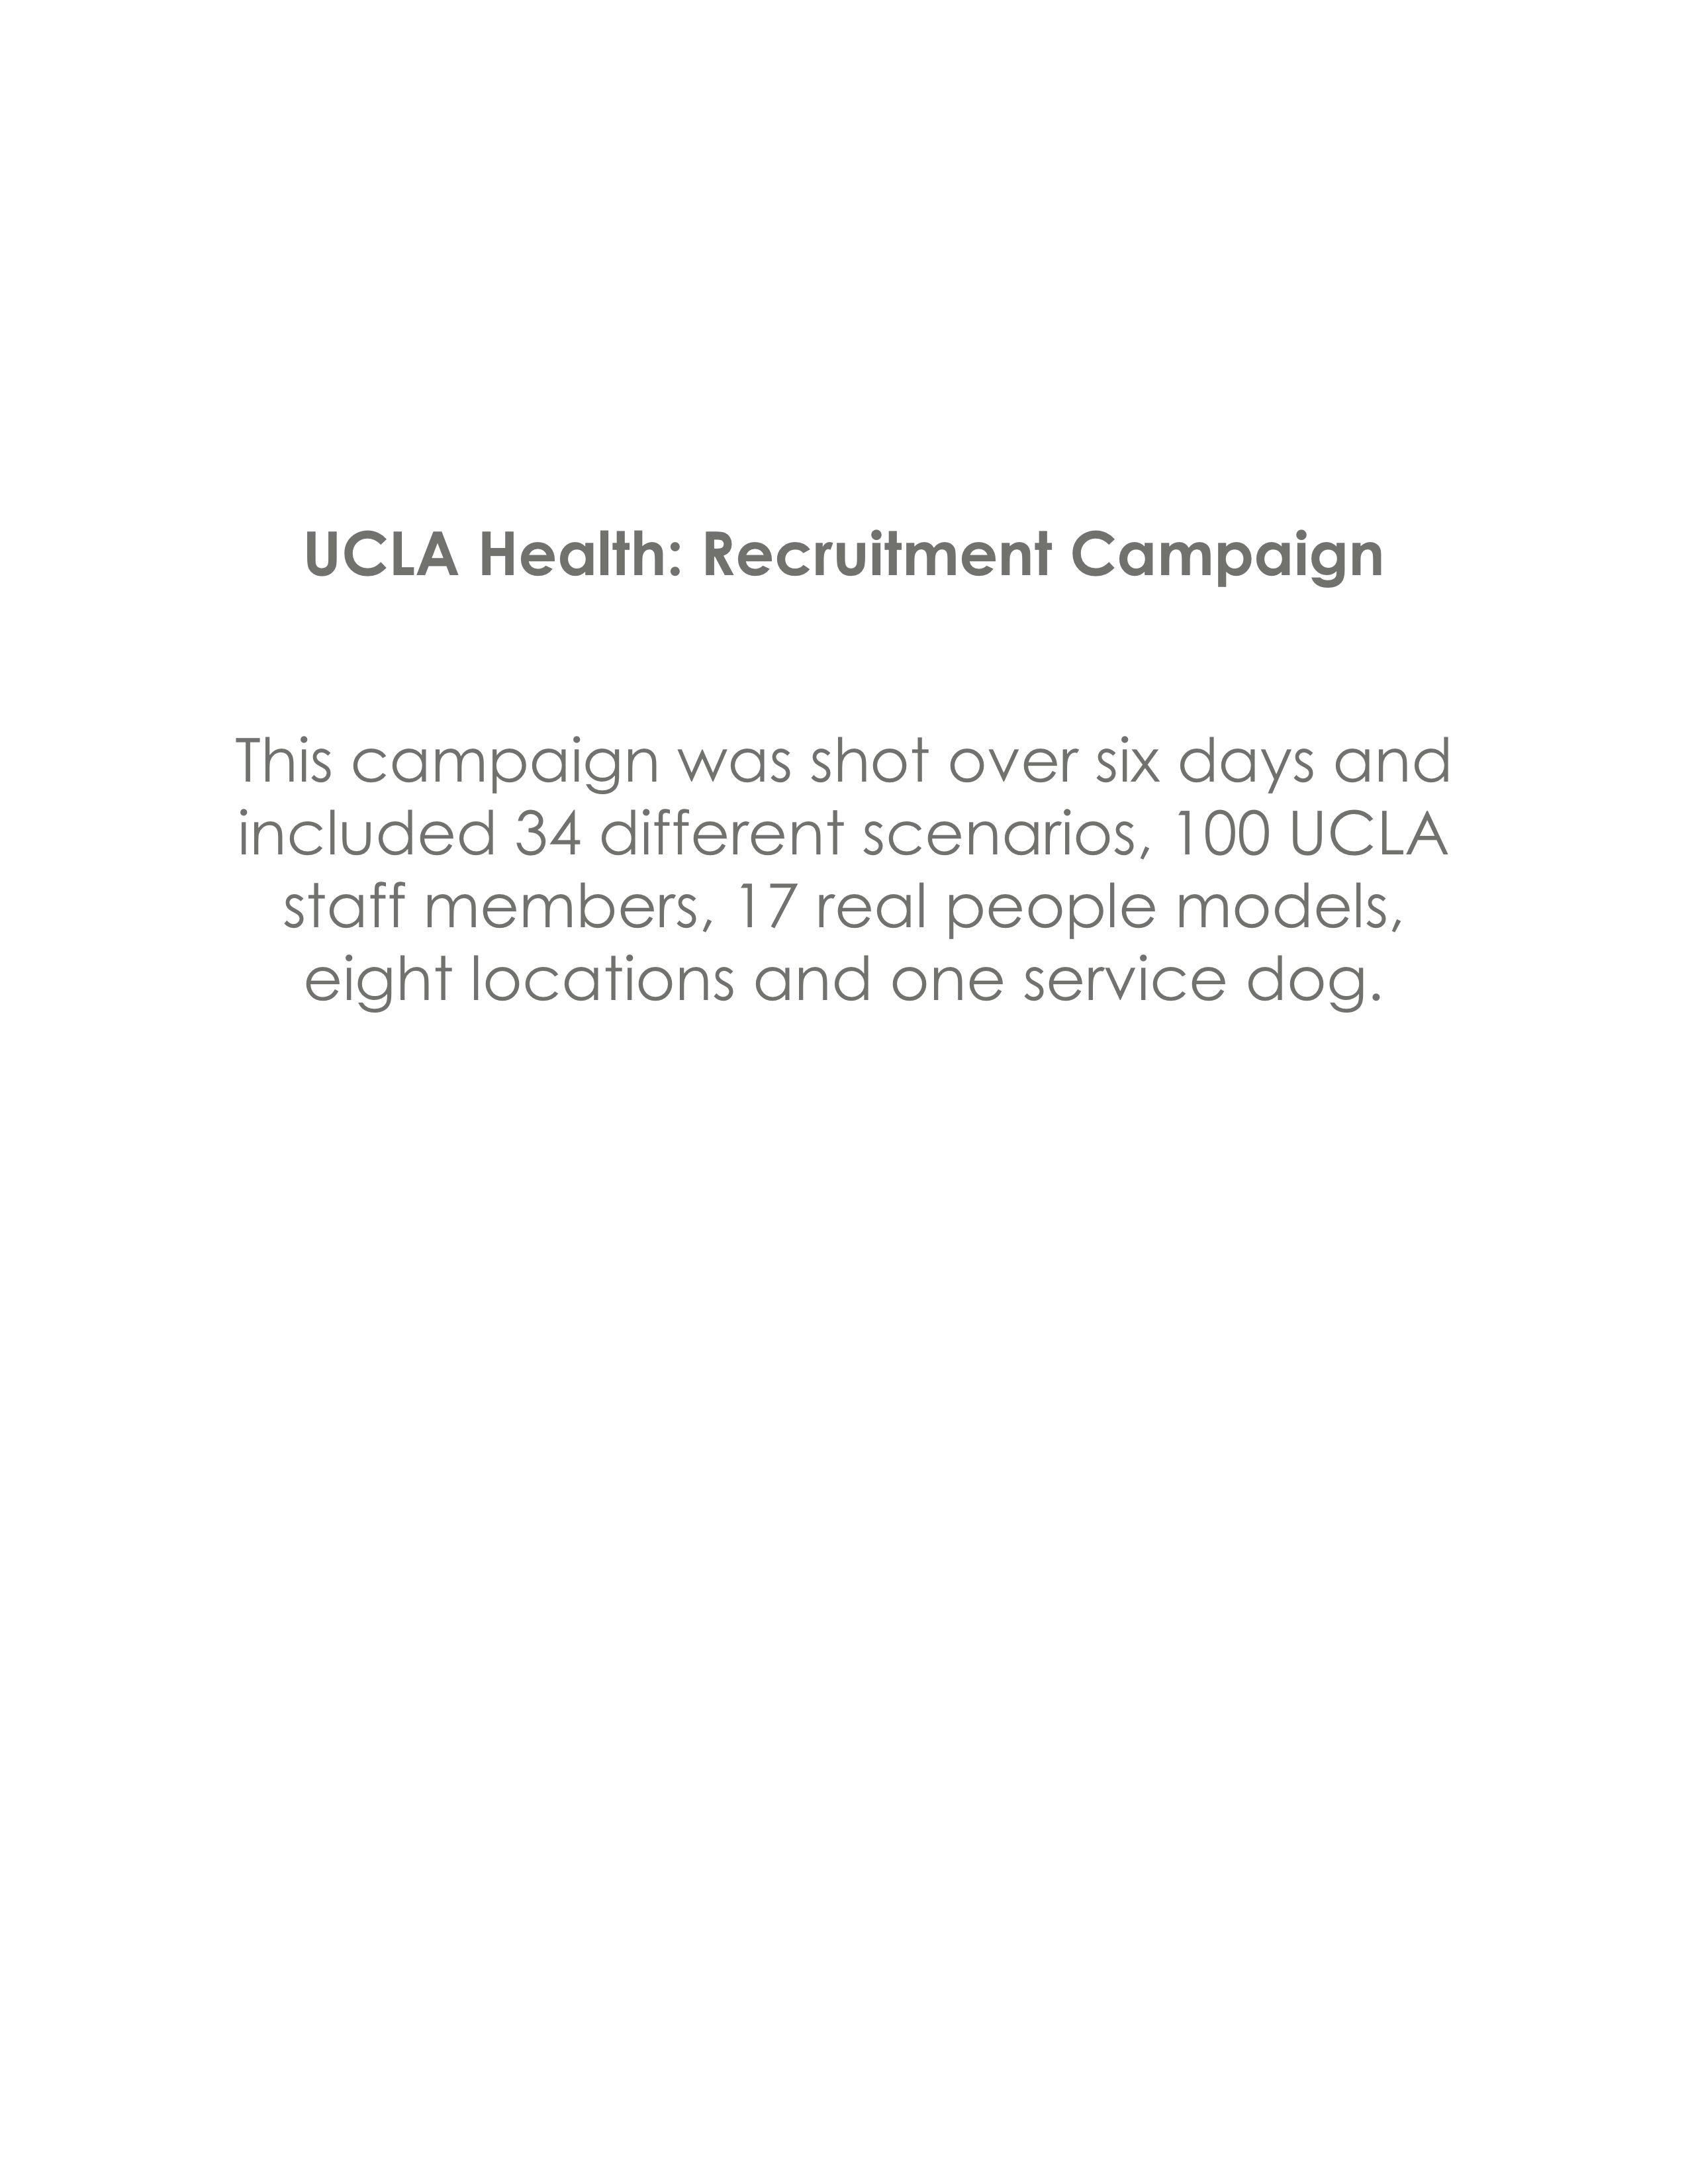 UCLA_Copy-2.jpg